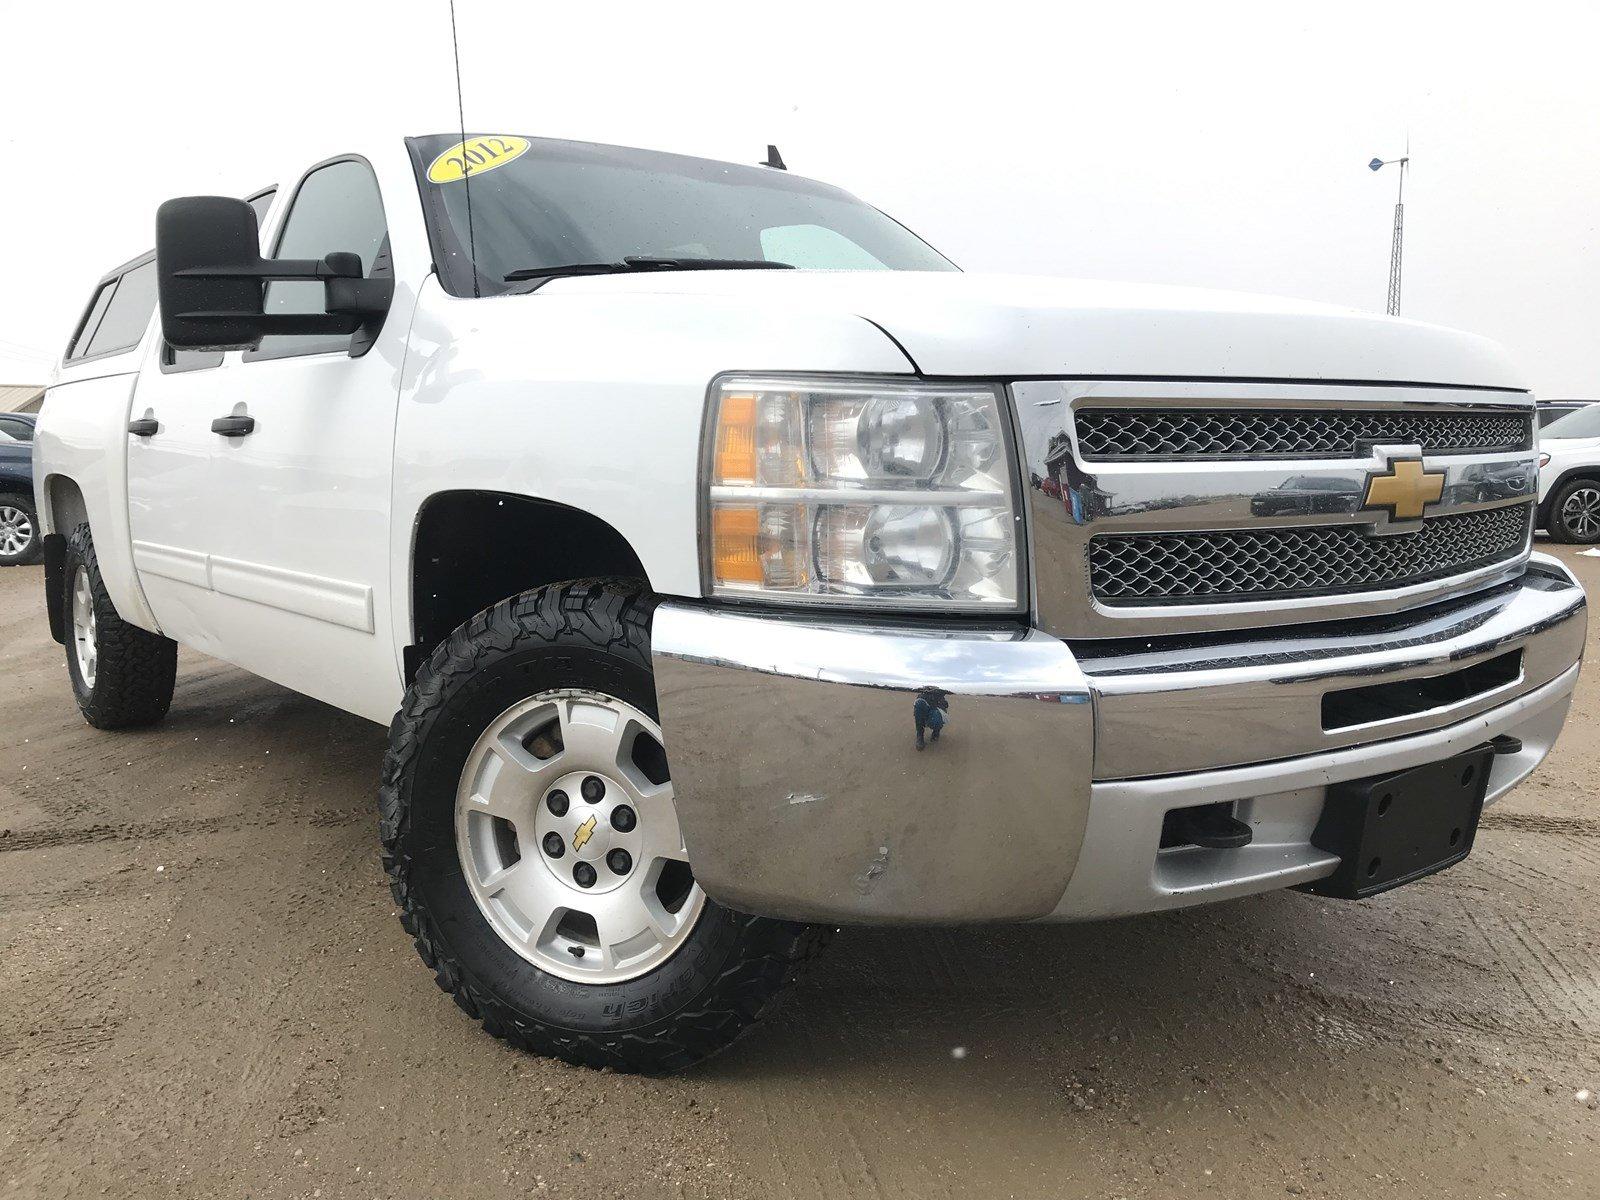 2012 Chevrolet Silverado 1500 LT**sold** Crew Cab Pickup